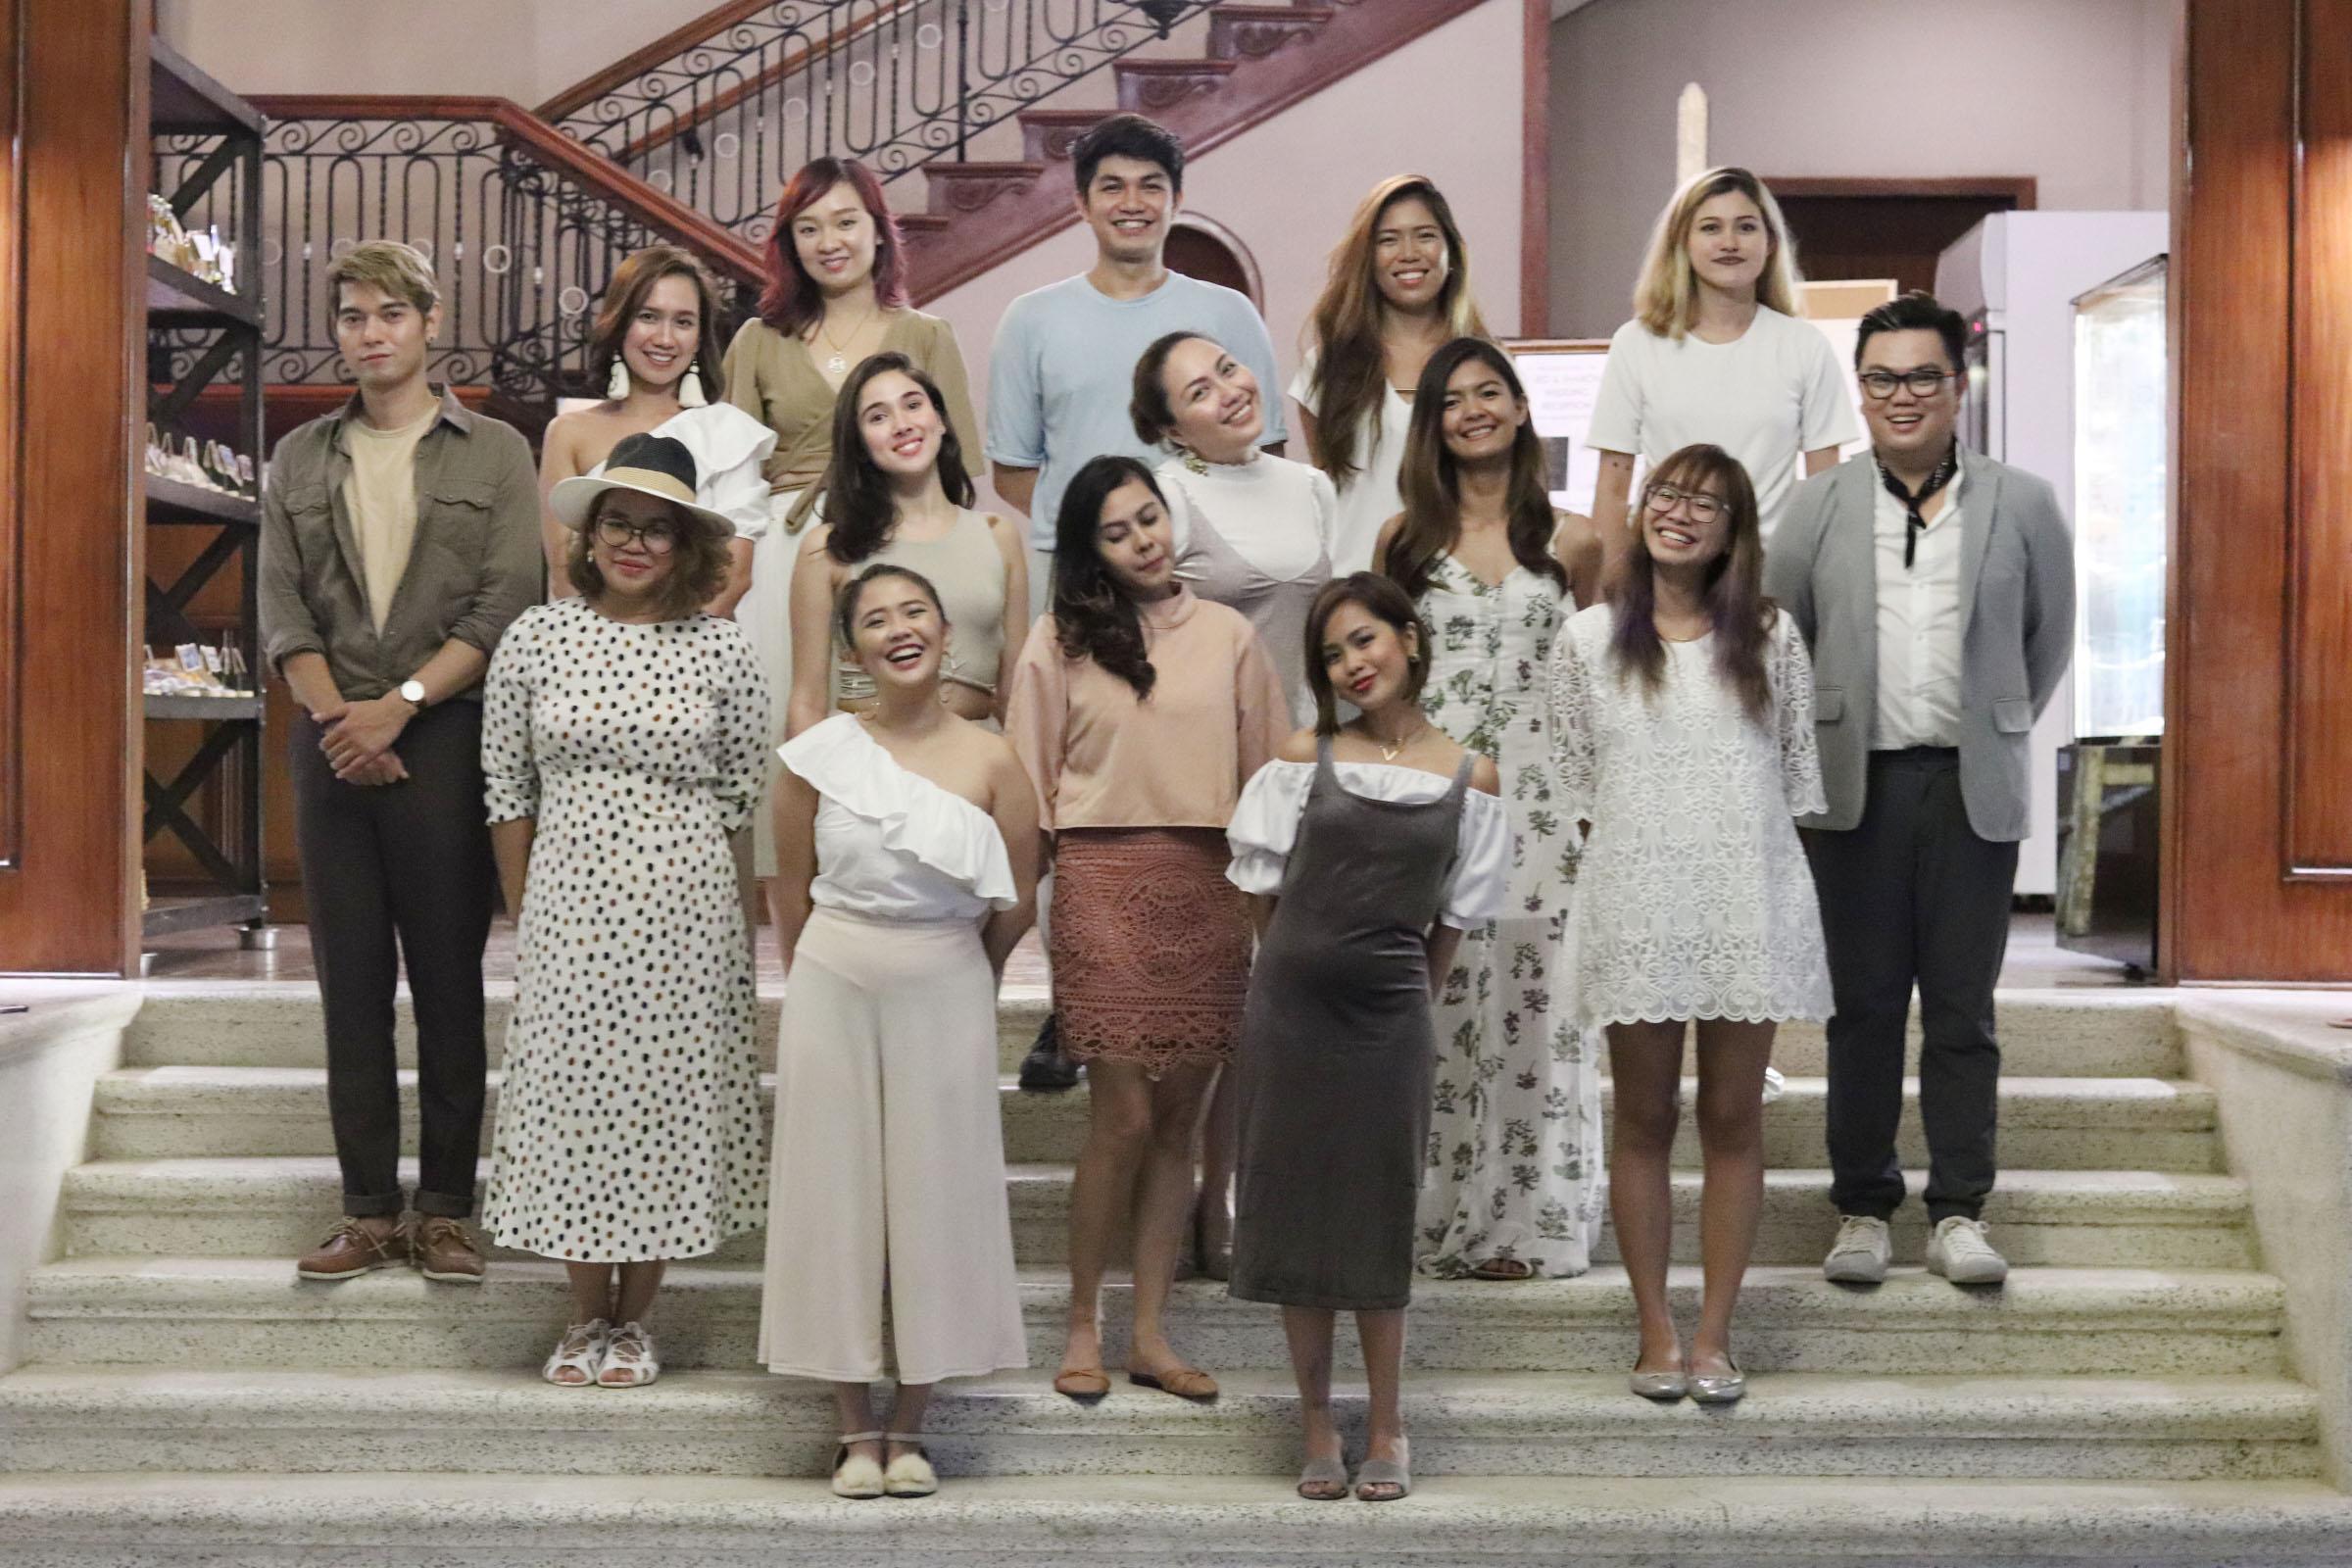 Cebu Fashion Bloggers 8th Anniversary Dinner Photo Diary